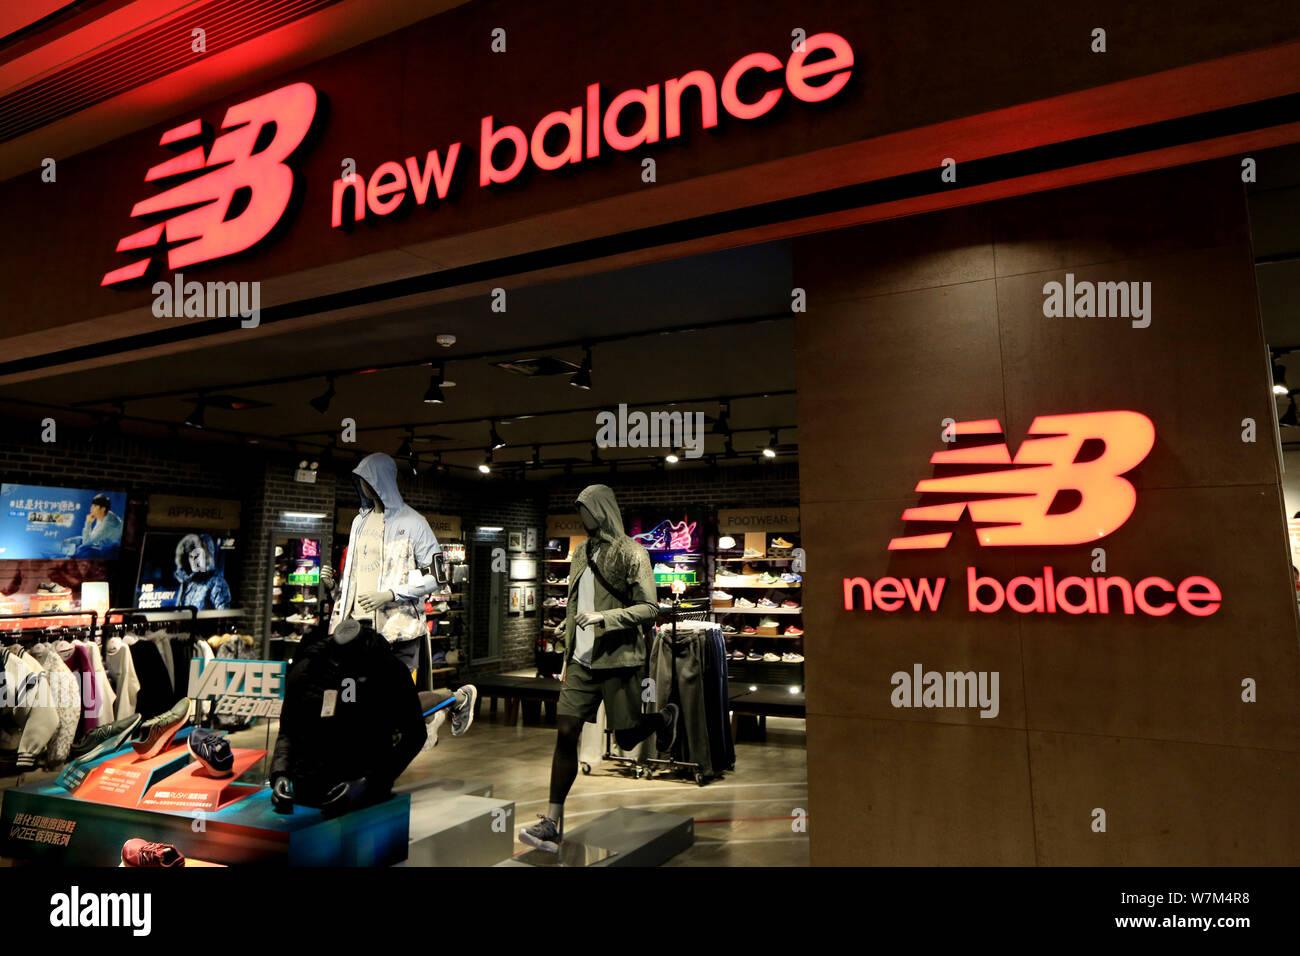 new balance locales